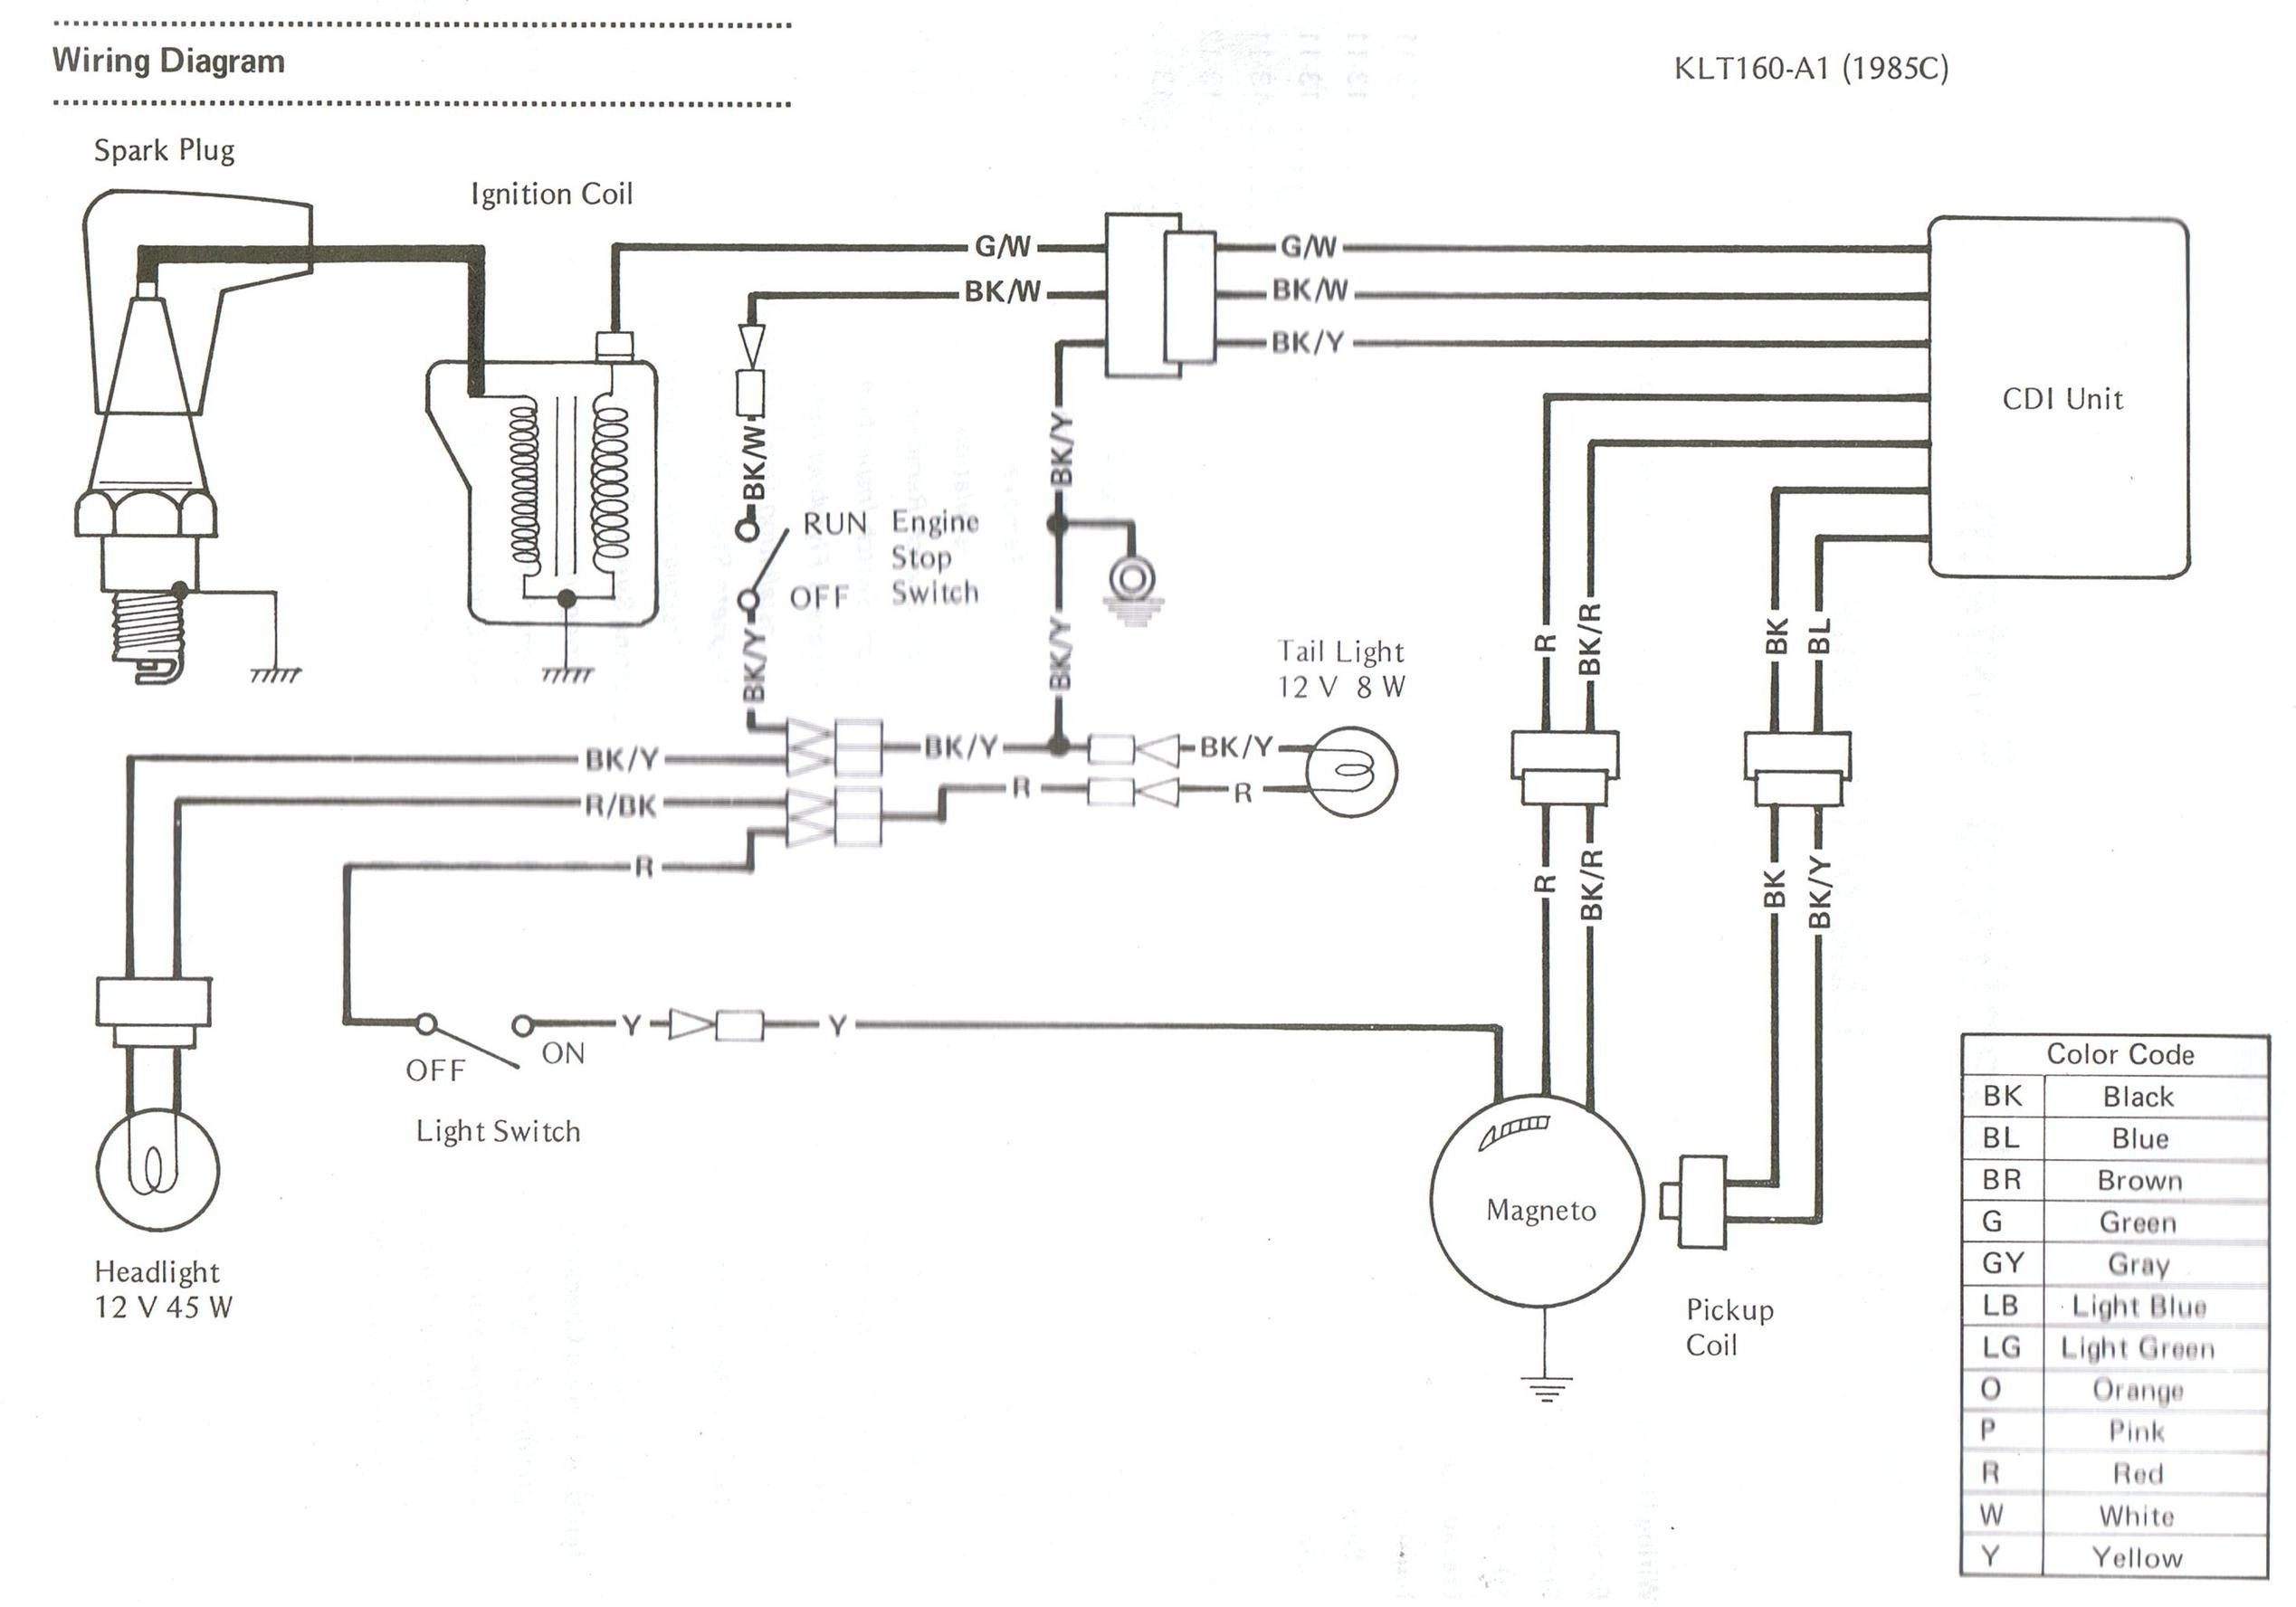 Wiring Diagram For Predator 420cc Ohv